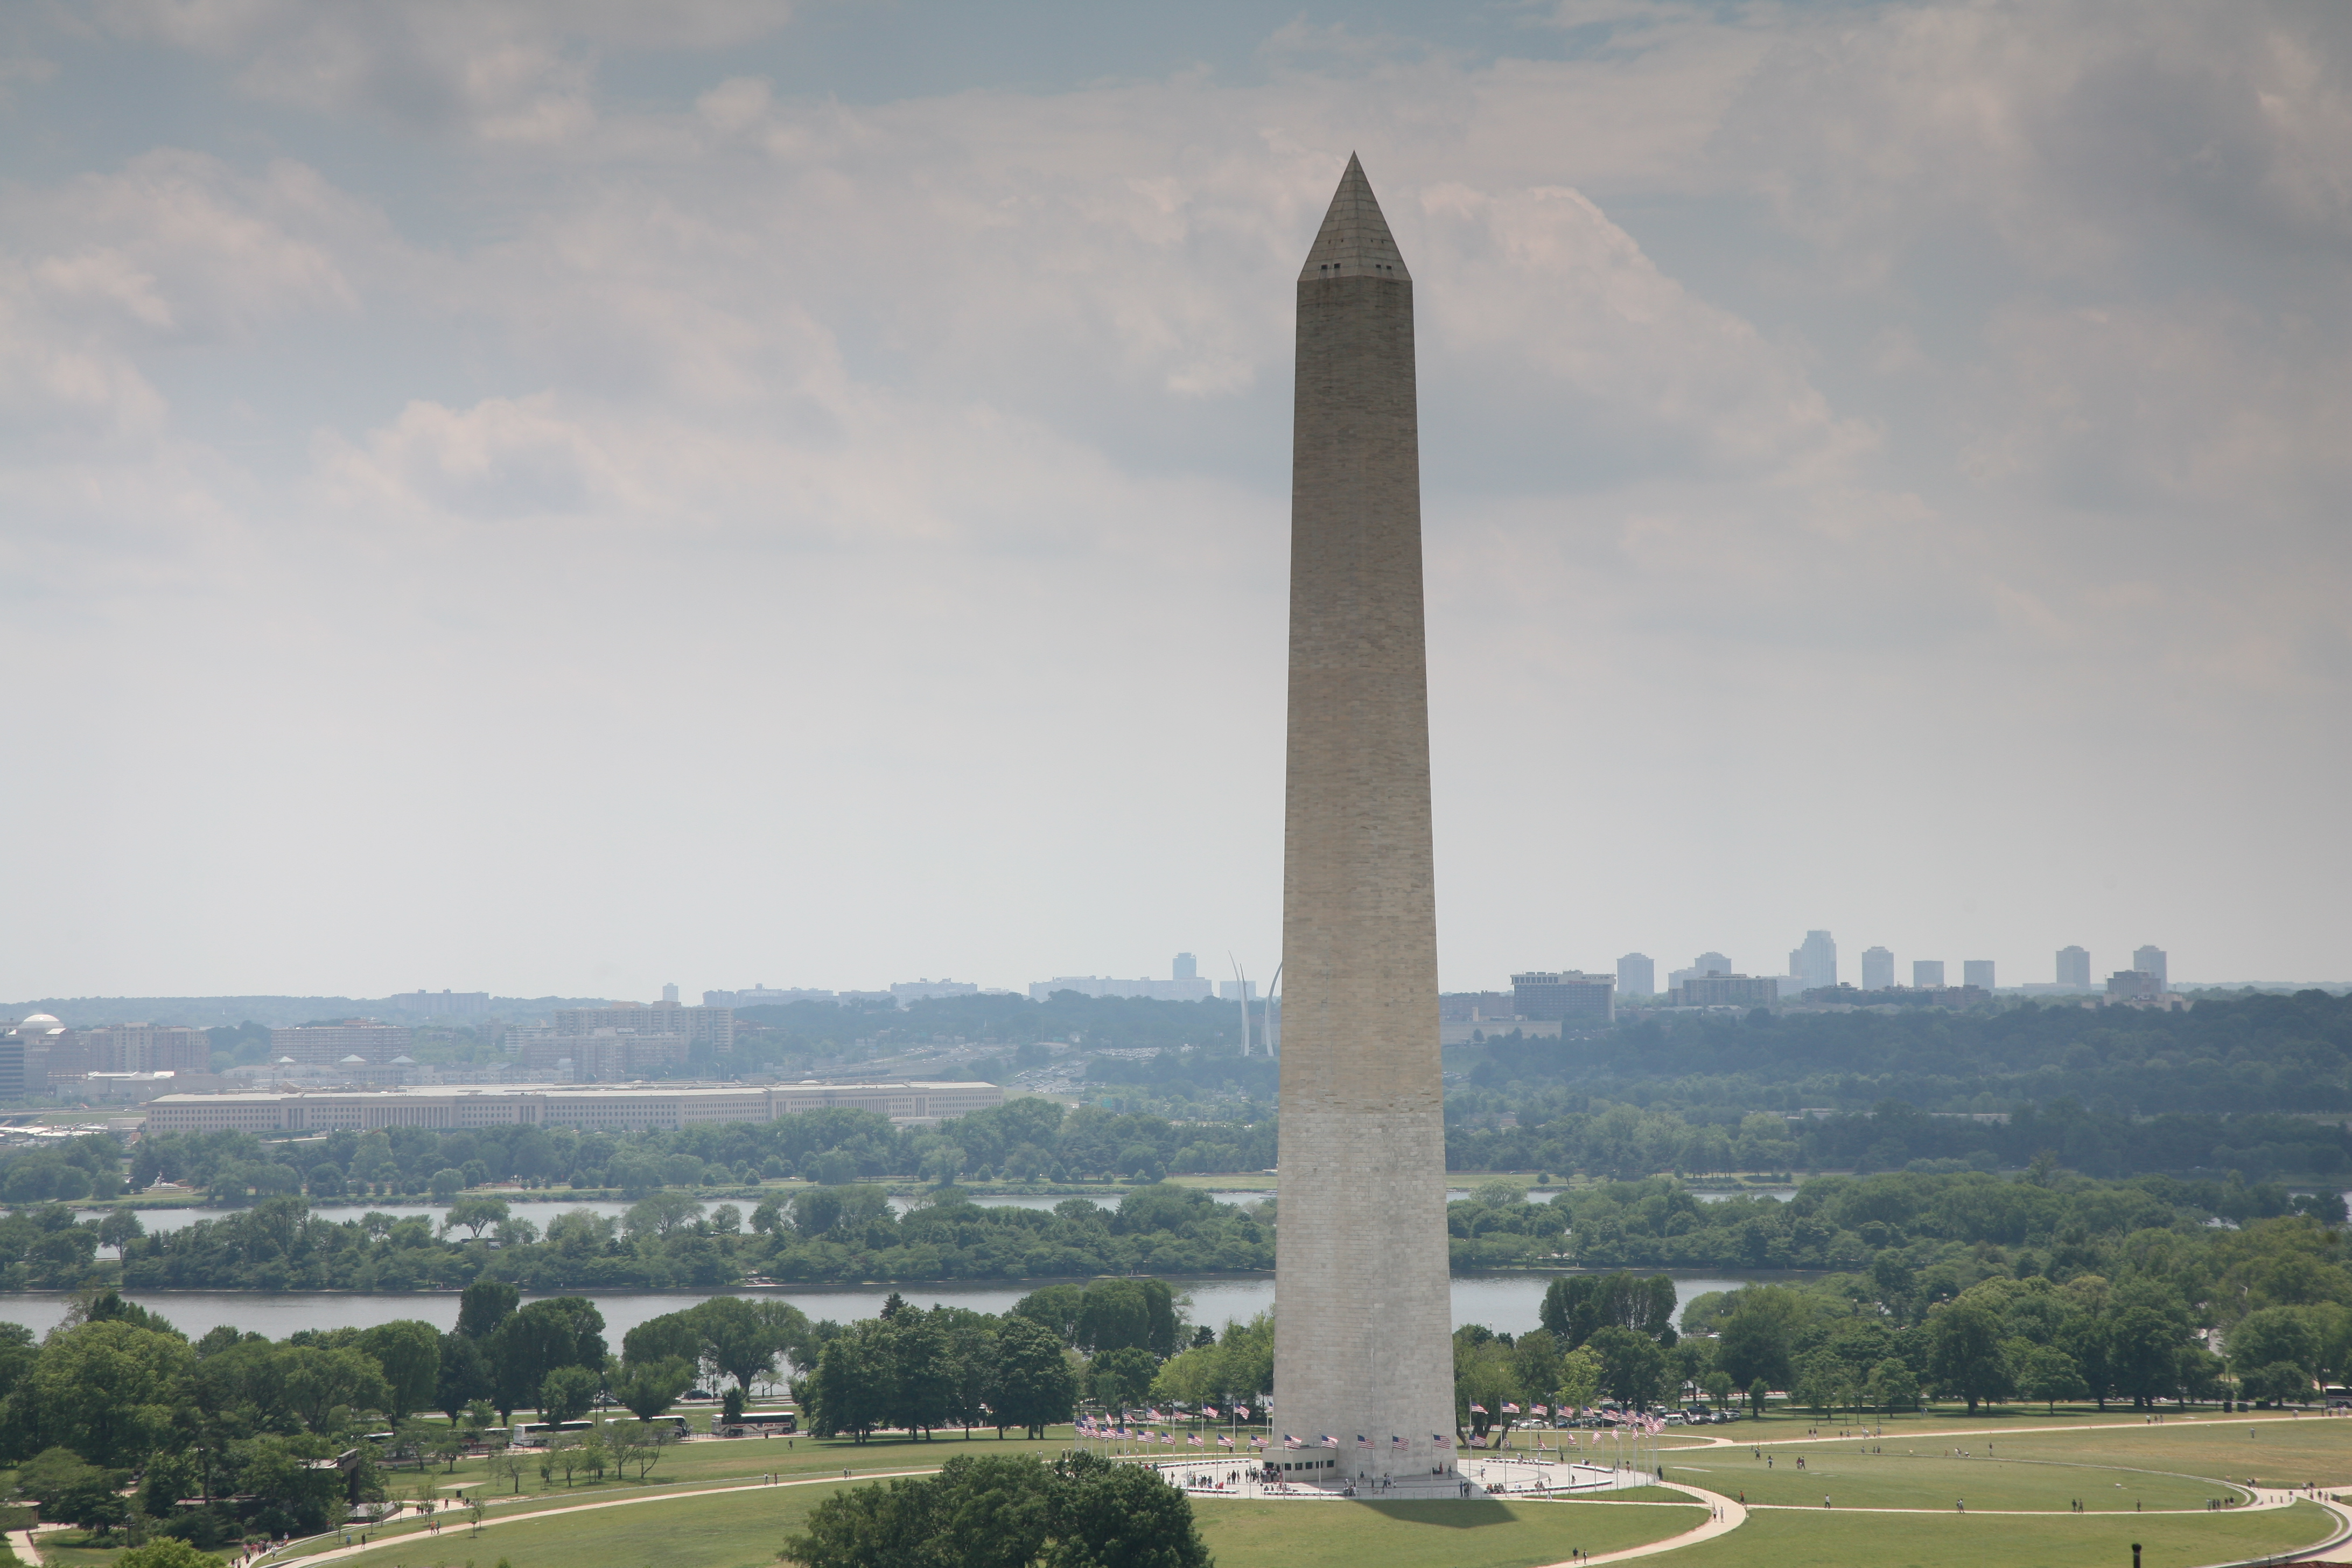 File:DC Washington Monument.jpg - Wikimedia Commons